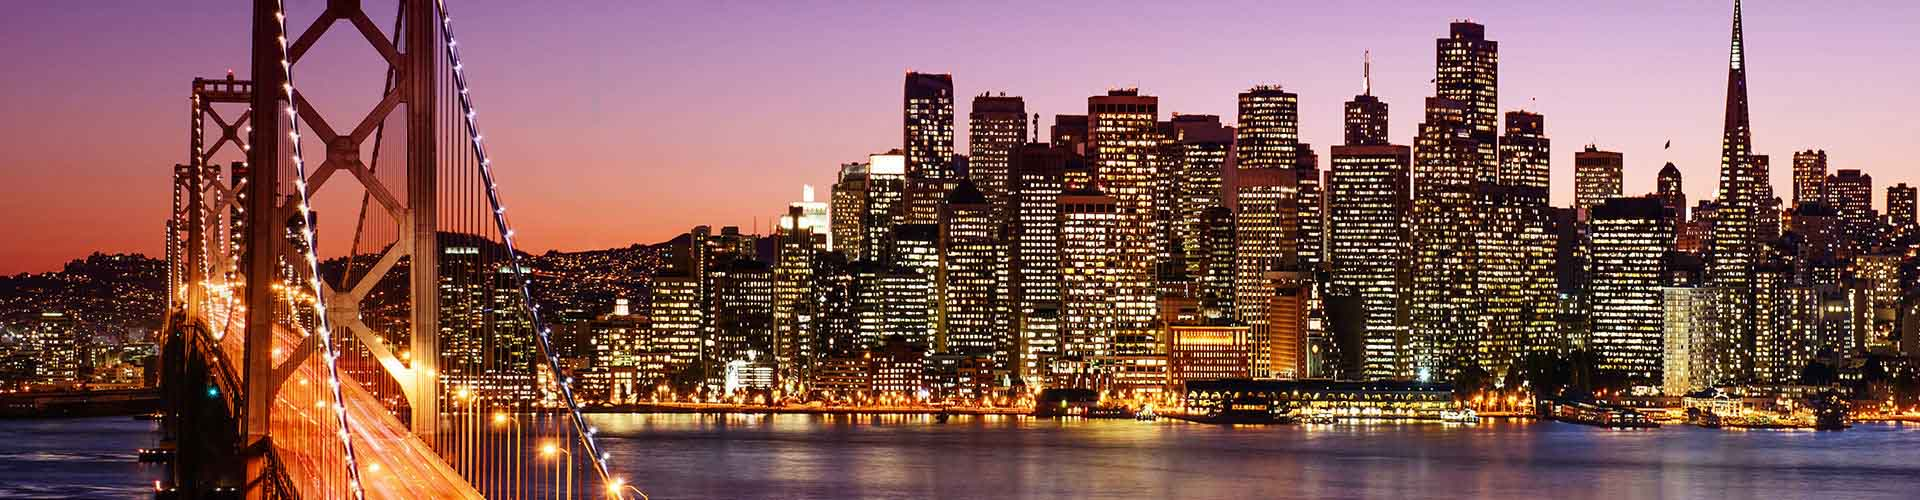 San Francisco - Alberghi a San Francisco. Mappe per San Francisco, Foto e  Recensioni per ogni Albergo a San Francisco.